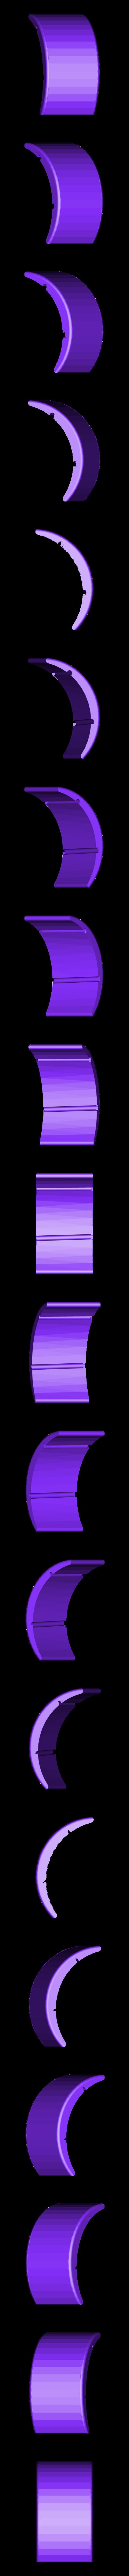 kappen-spatbordt-voor-l.stl Download free STL file trick (custom) • 3D printer model, jasperbaudoin